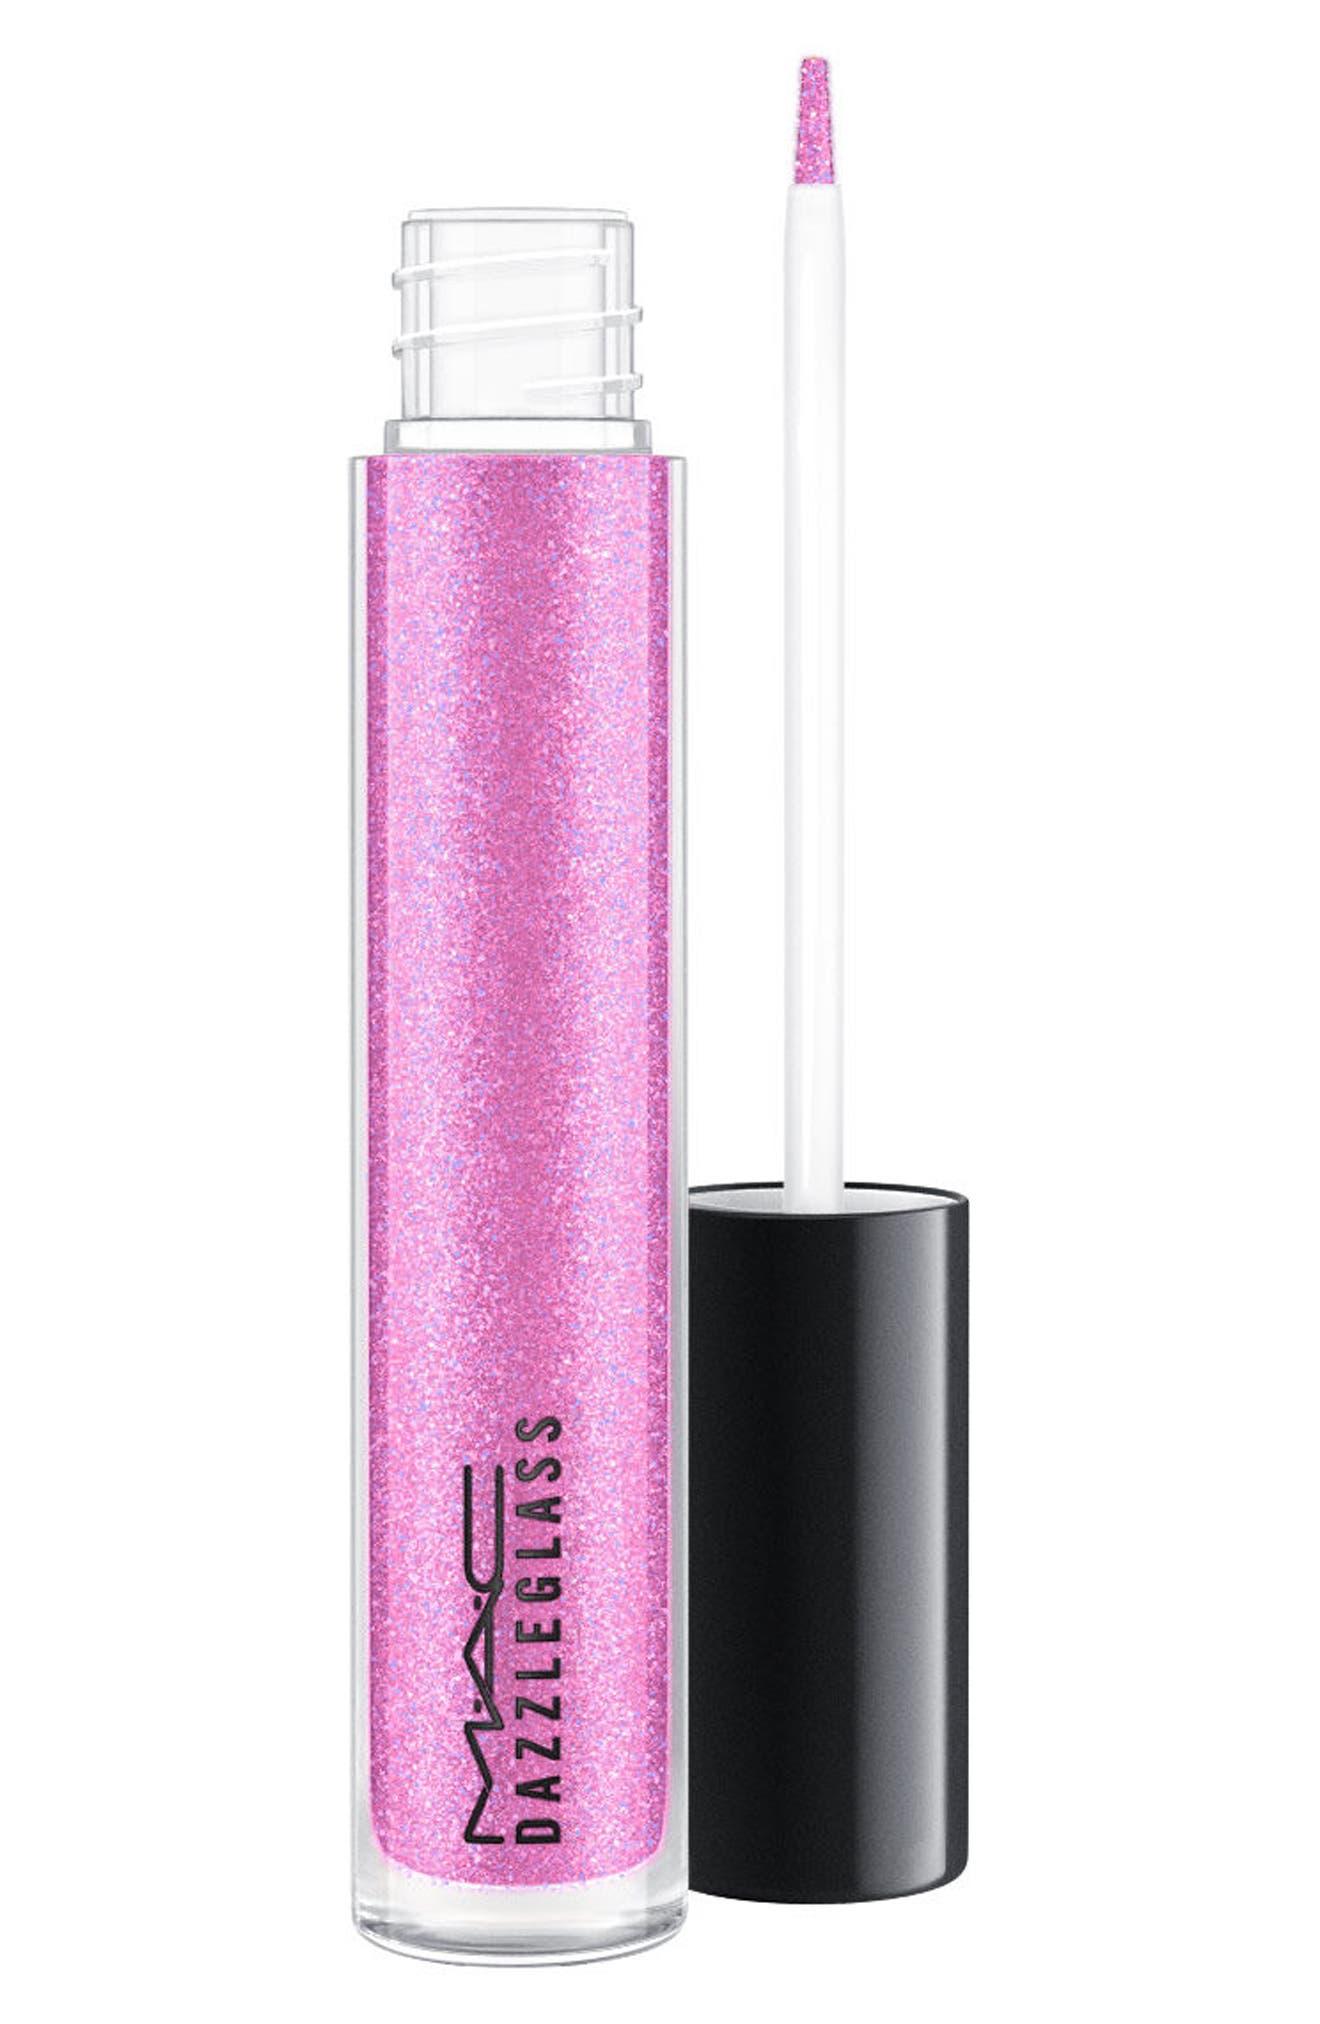 MAC Supernatural Dazzle Dazzleglass Lipcolour